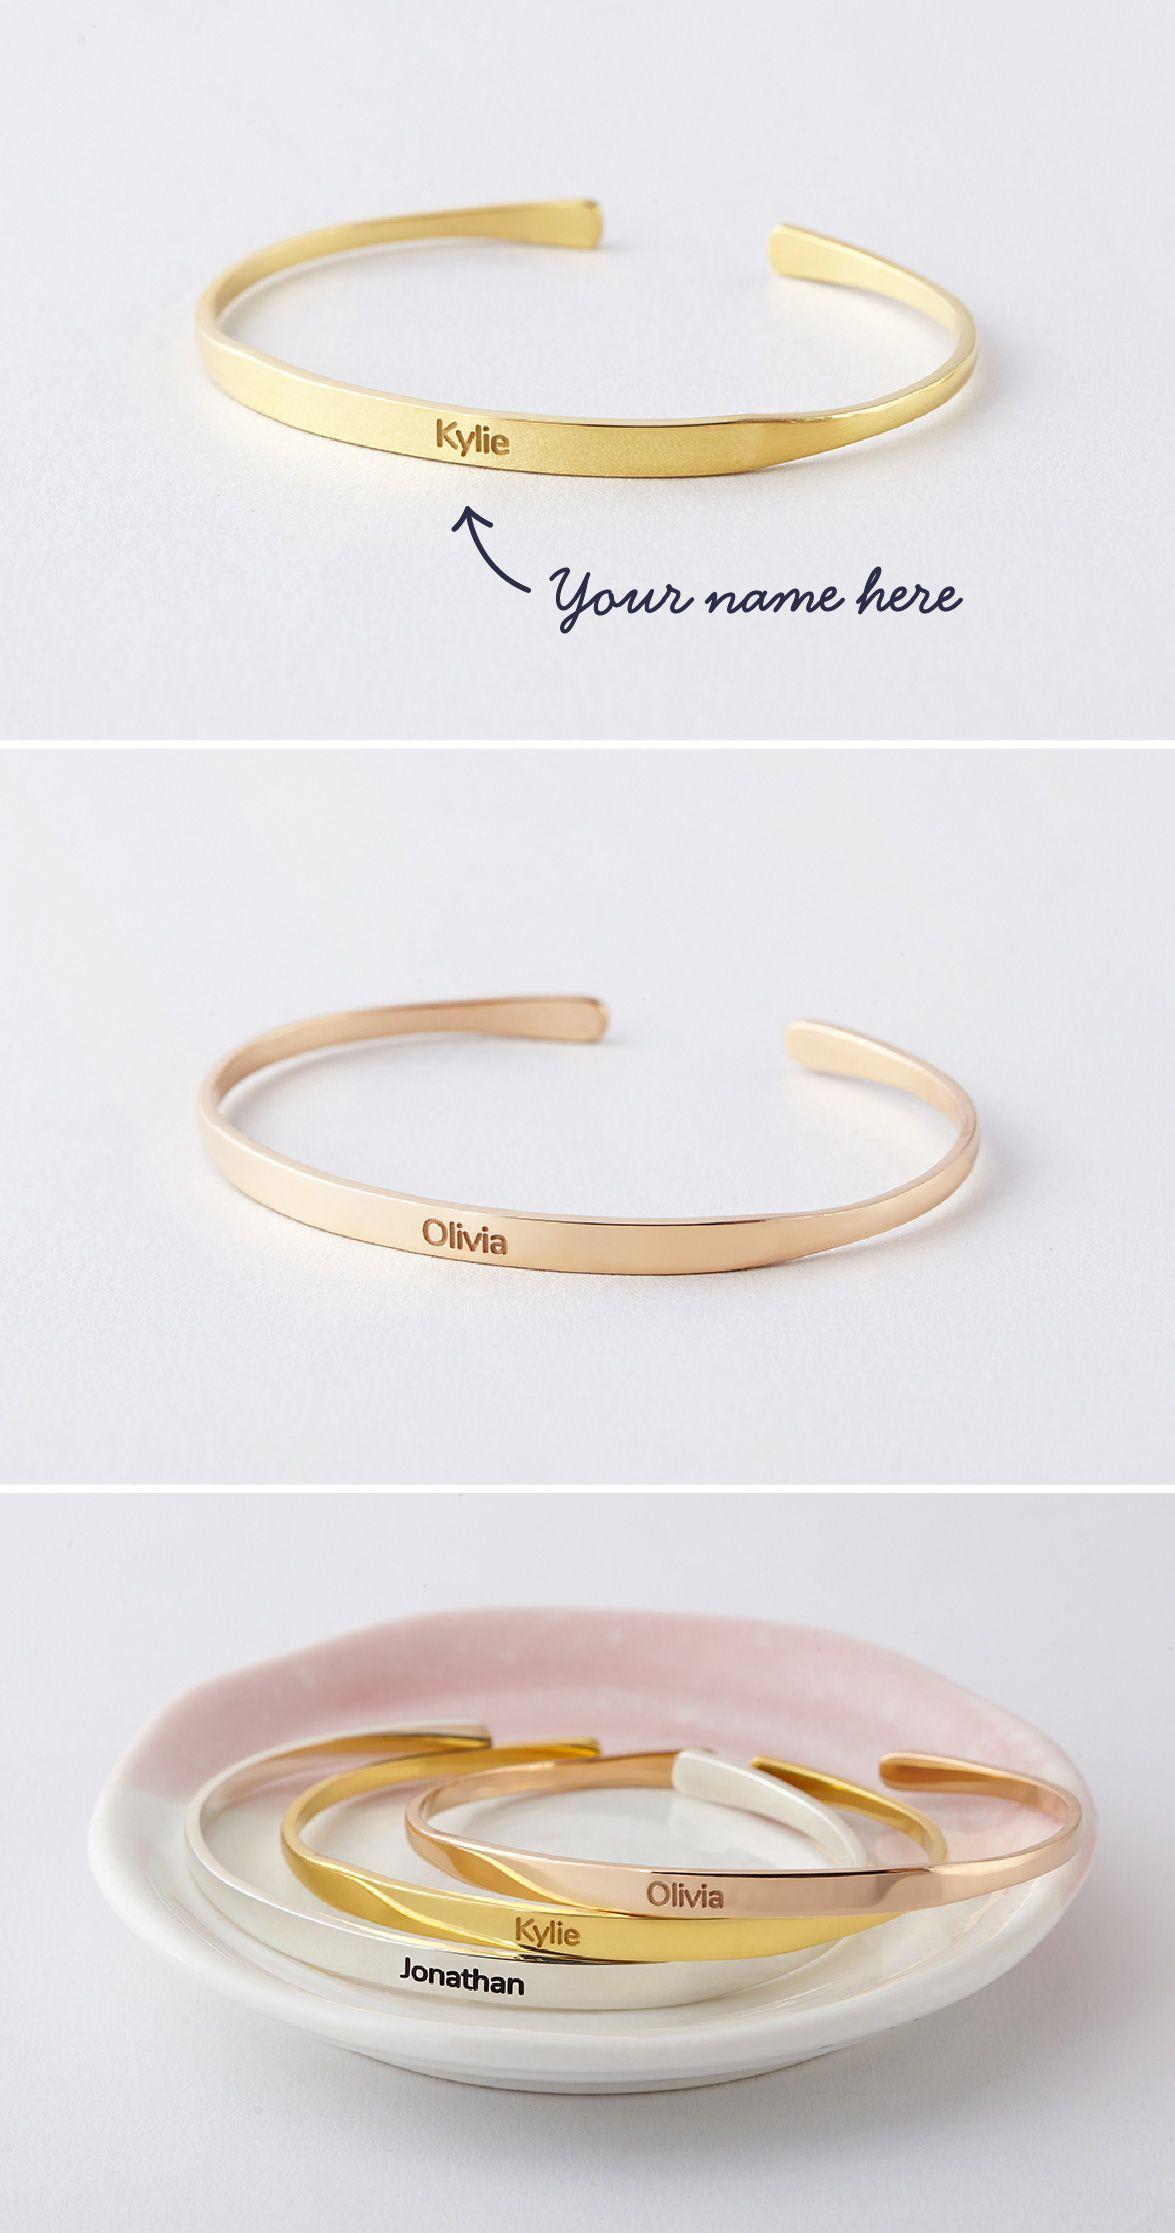 Name bracelet u bracelet with name u custom bracelets u cuff name